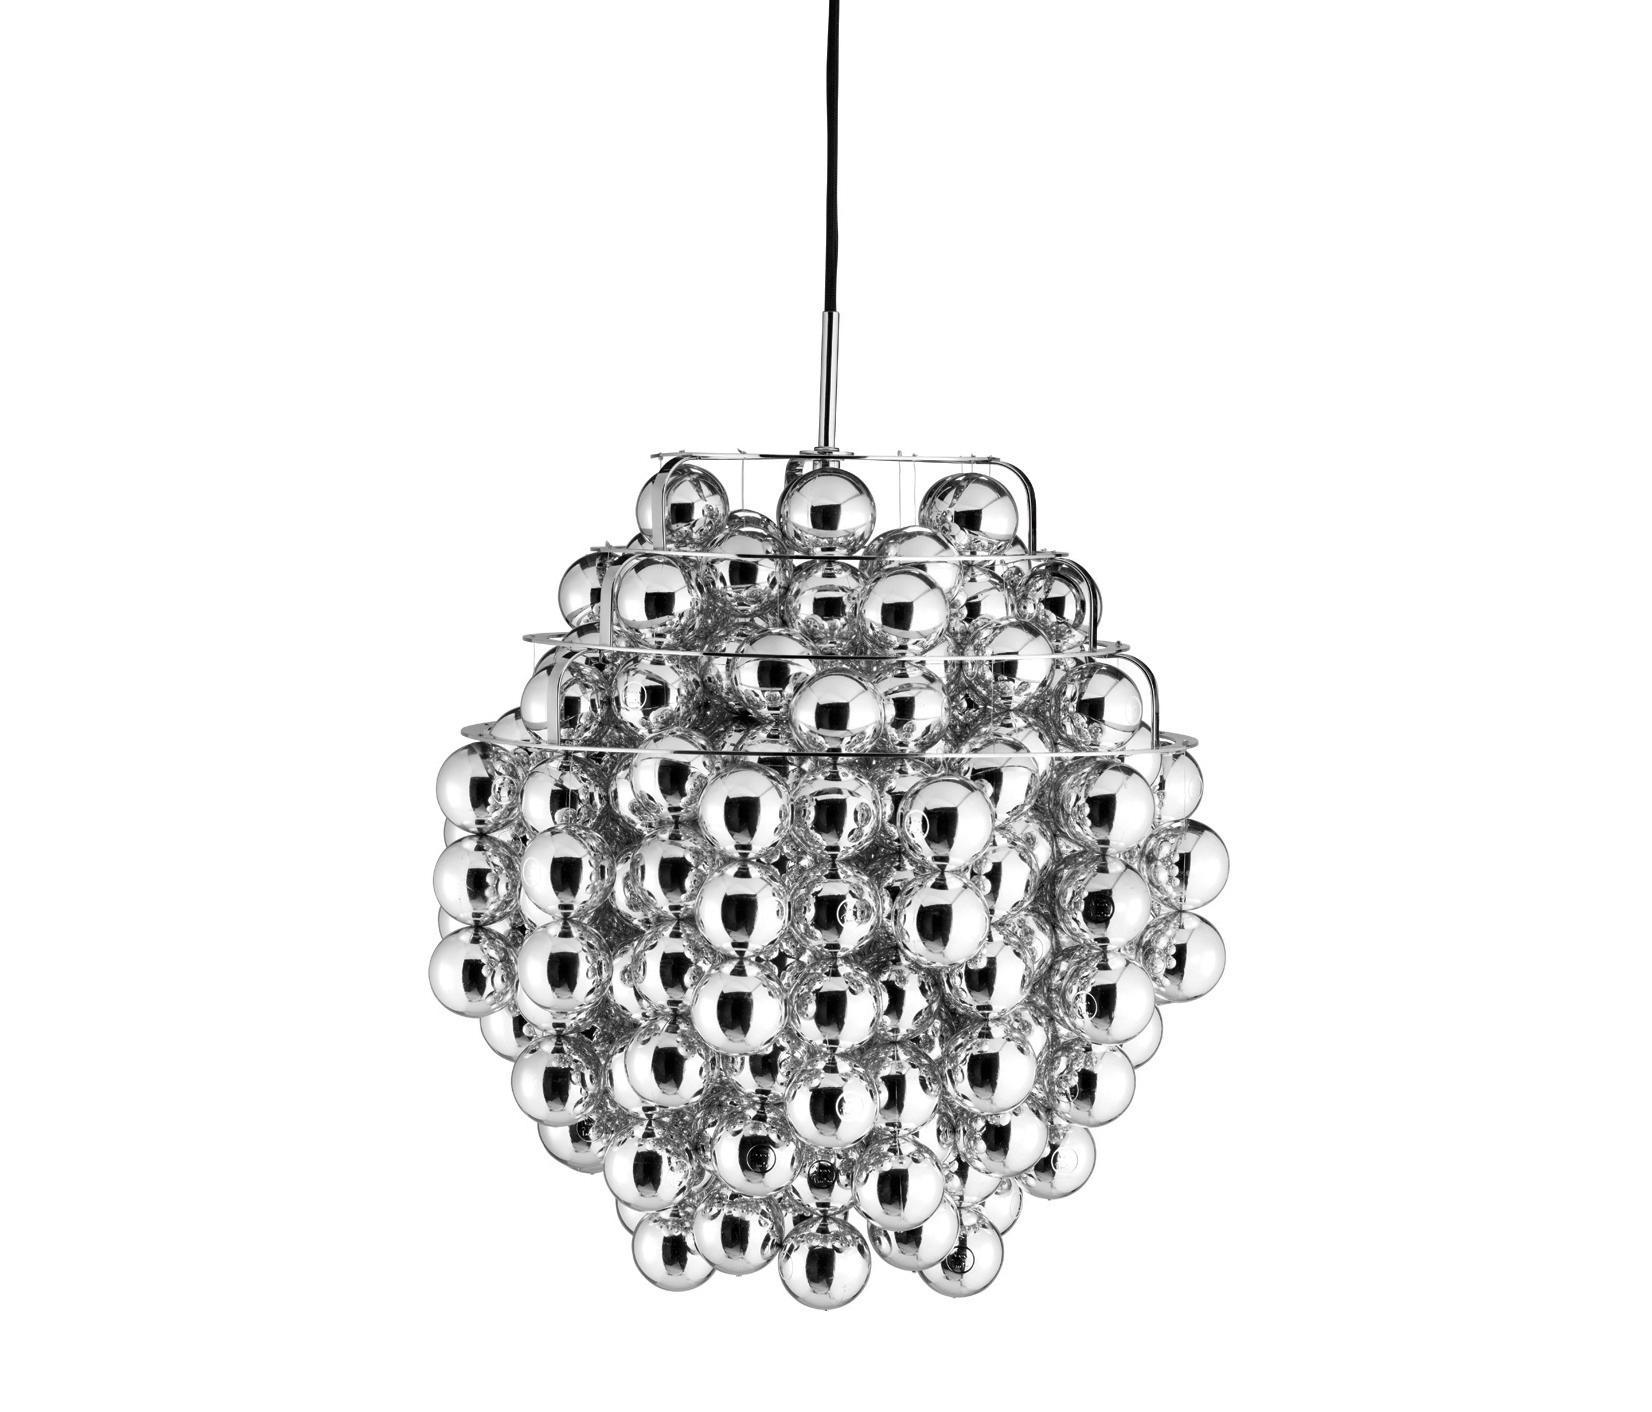 ball pendant lighting. Ball | Pendant By Verpan General Lighting H